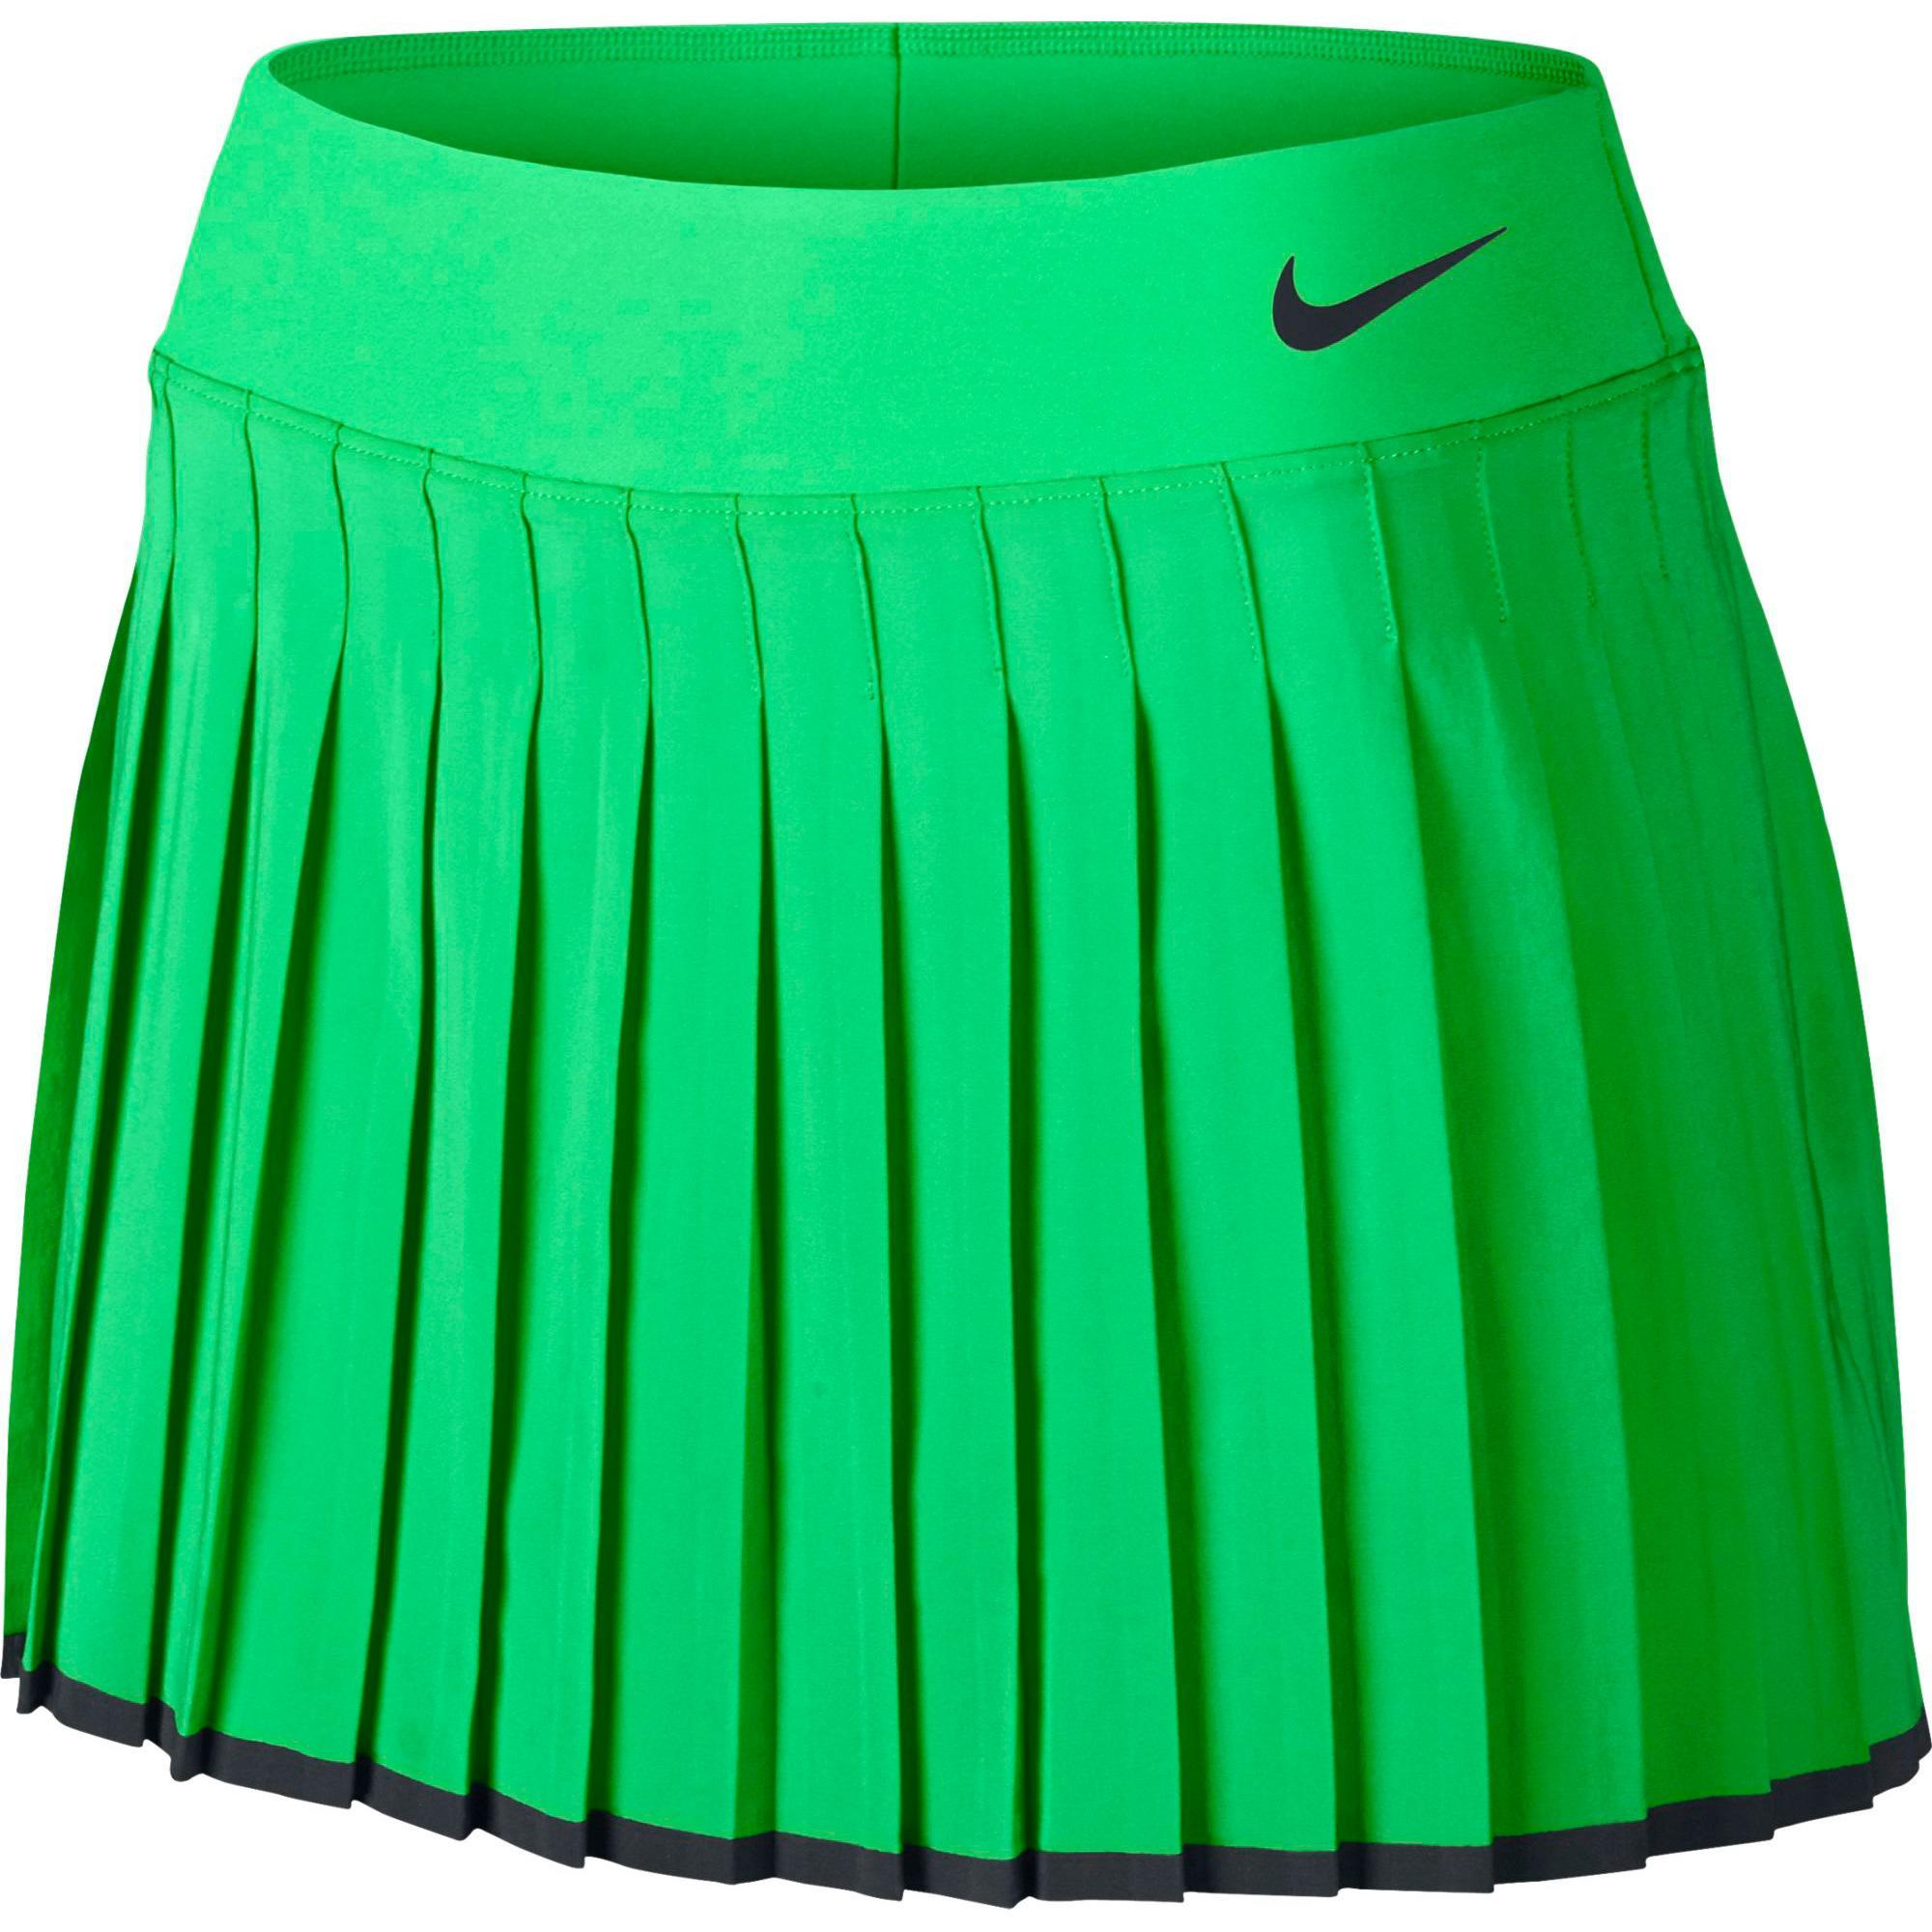 284dc0393 Nike Womens Victory Tennis Skort - Electro Green - Tennisnuts.com